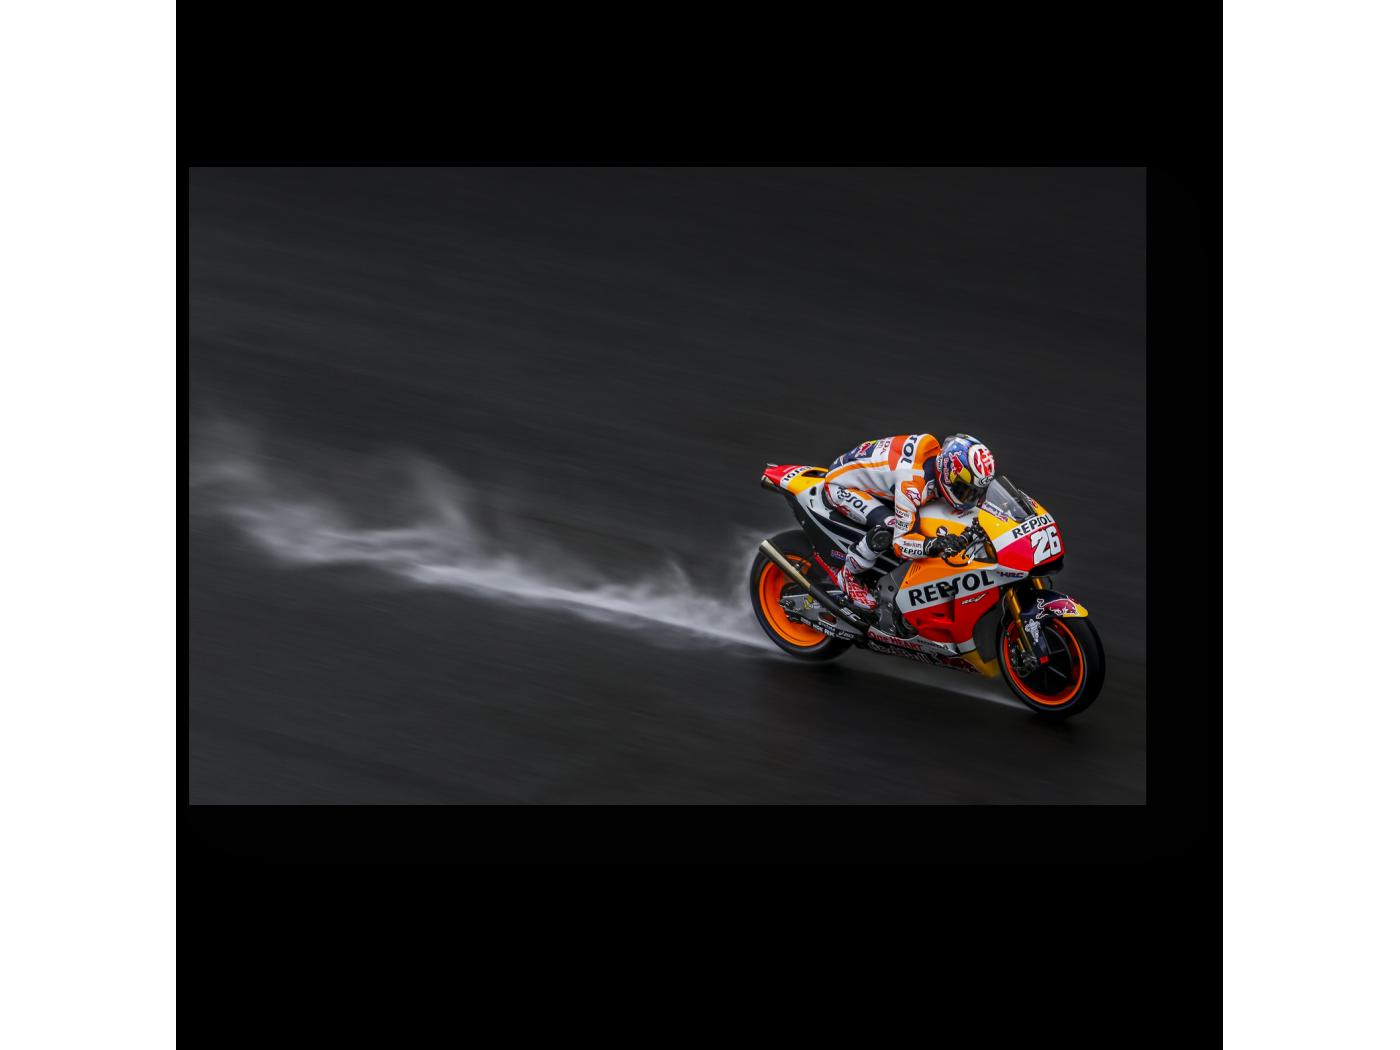 Модульная картина Гонщик команды Repsol Honda (30x20) фото